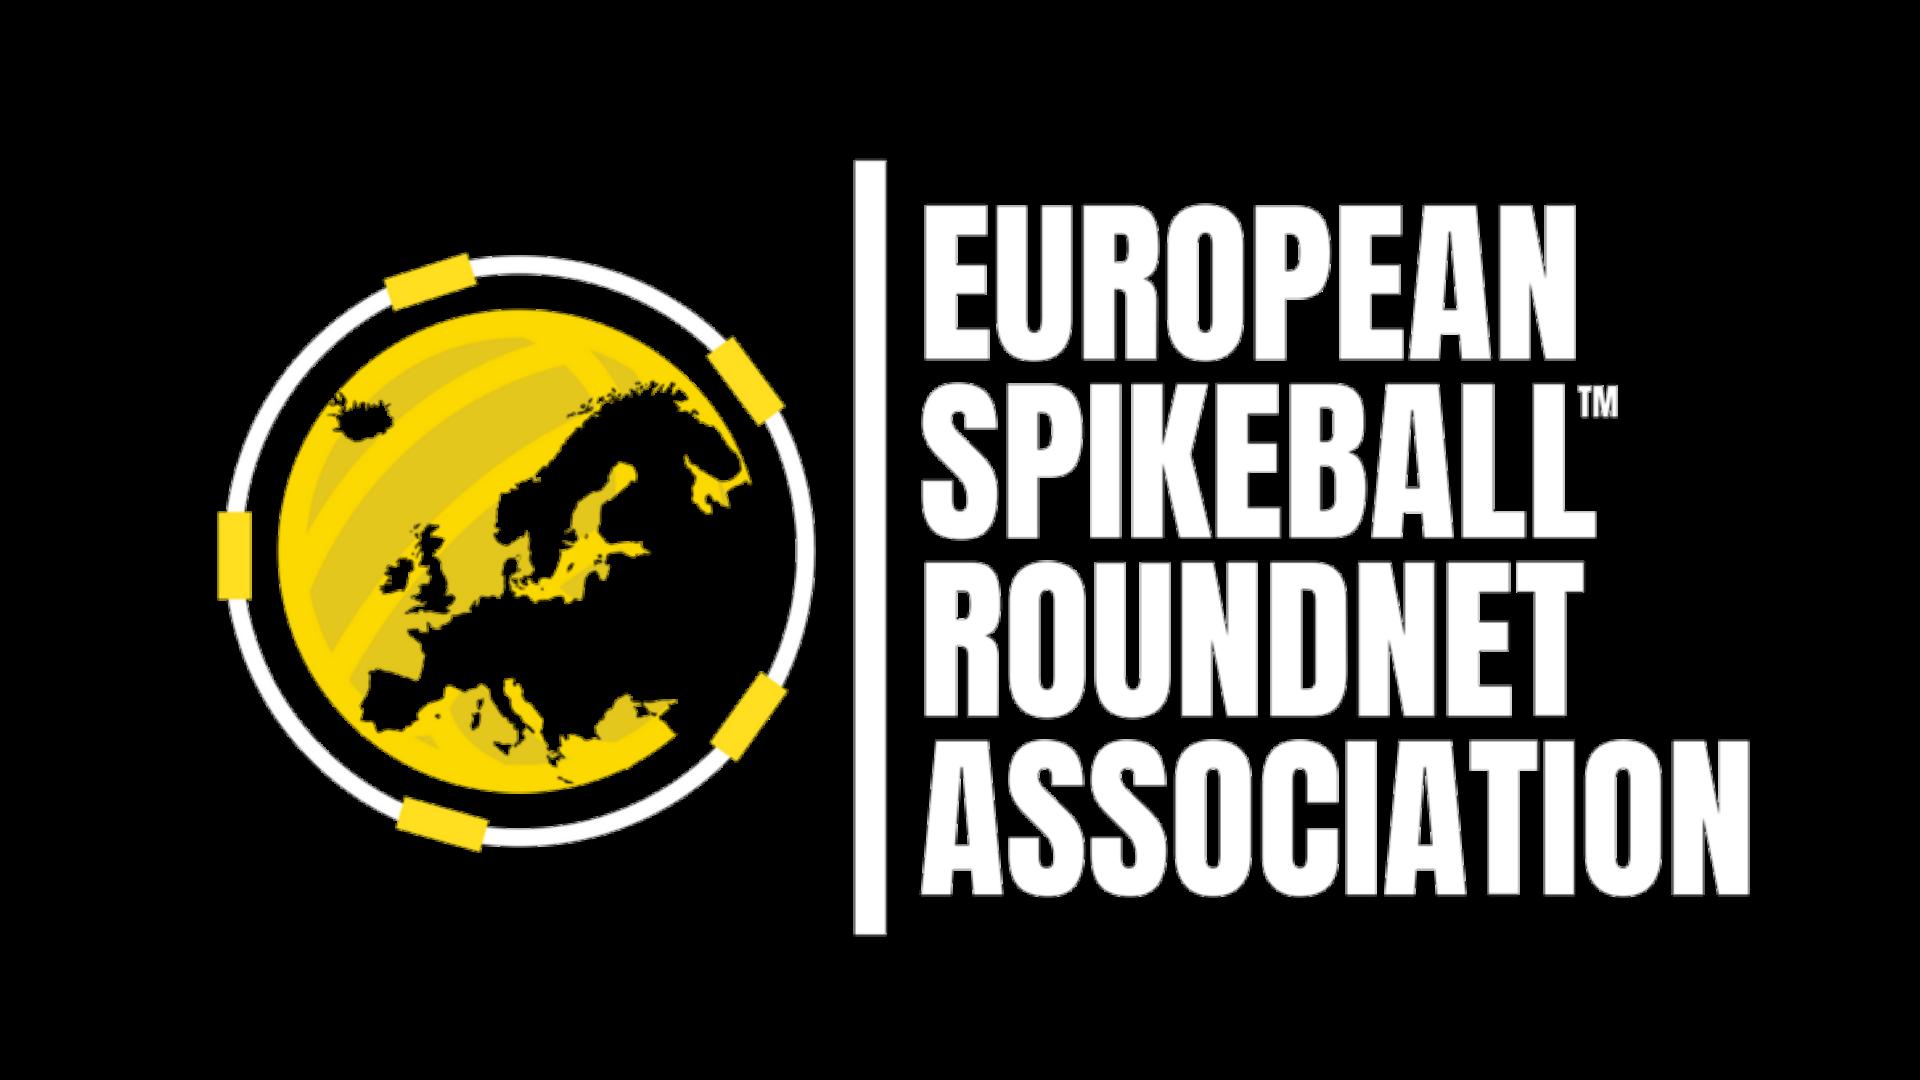 https://asociace.roundnet.cz/wp-content/uploads/2019/12/Copy-of-Copy-of-EUSRA-logo-BIG-ONE-1.png